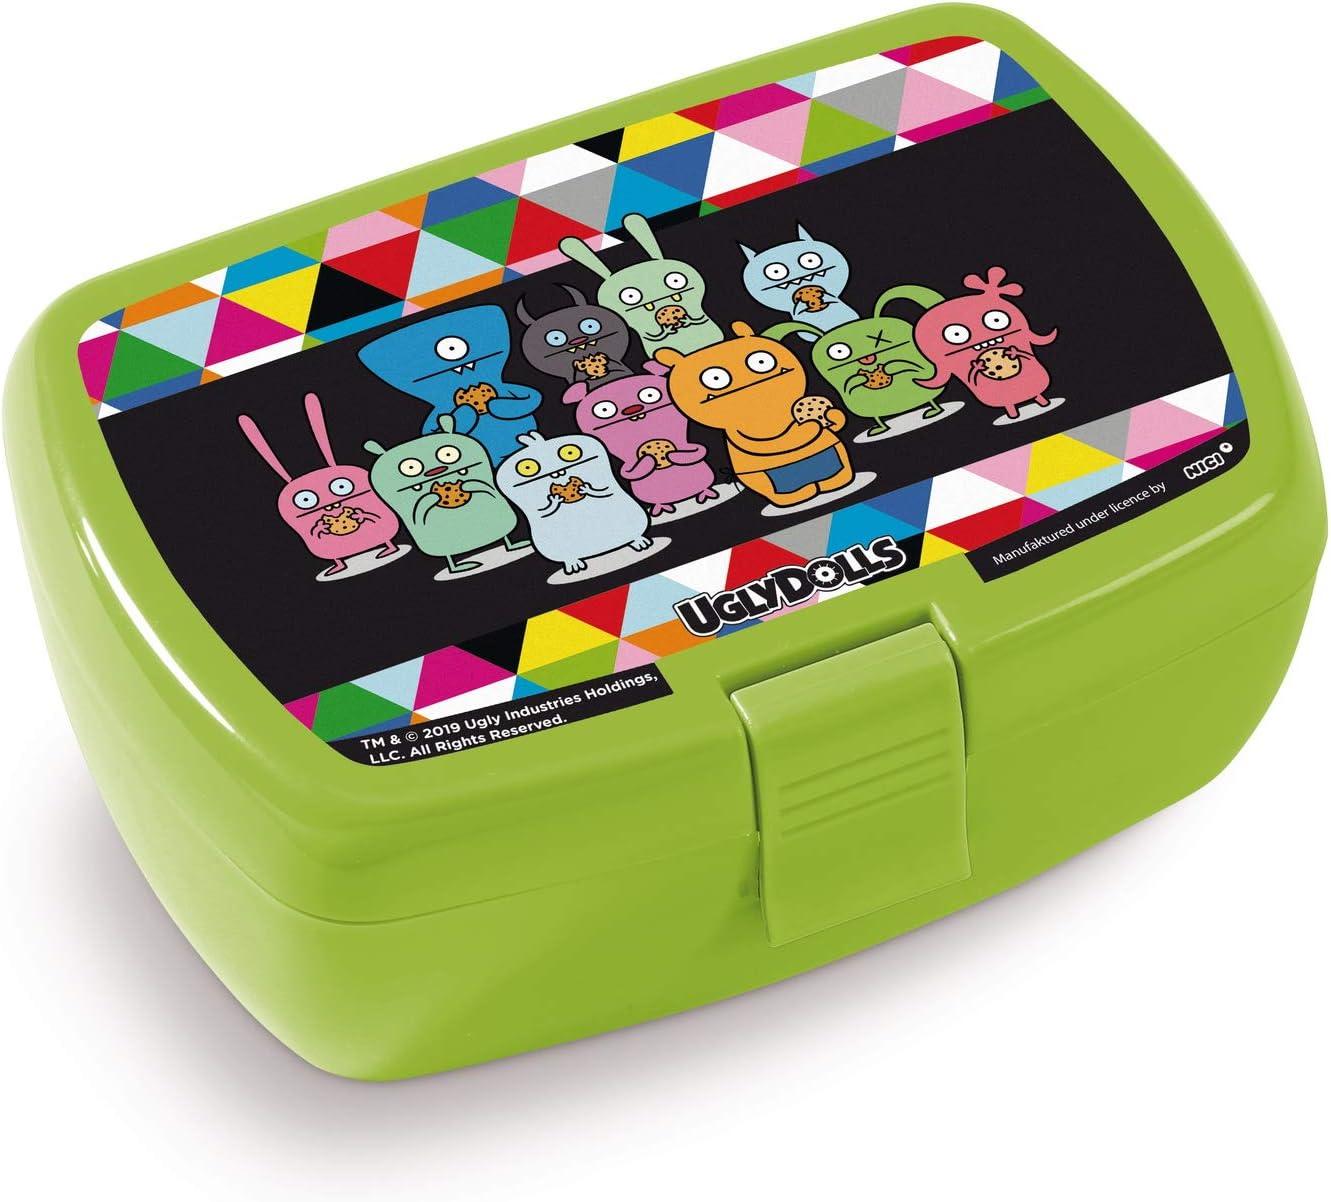 Nici 42955 Lunch Box Ugly Dolls 17 x 12 x 6.8 cm Multi-Coloured